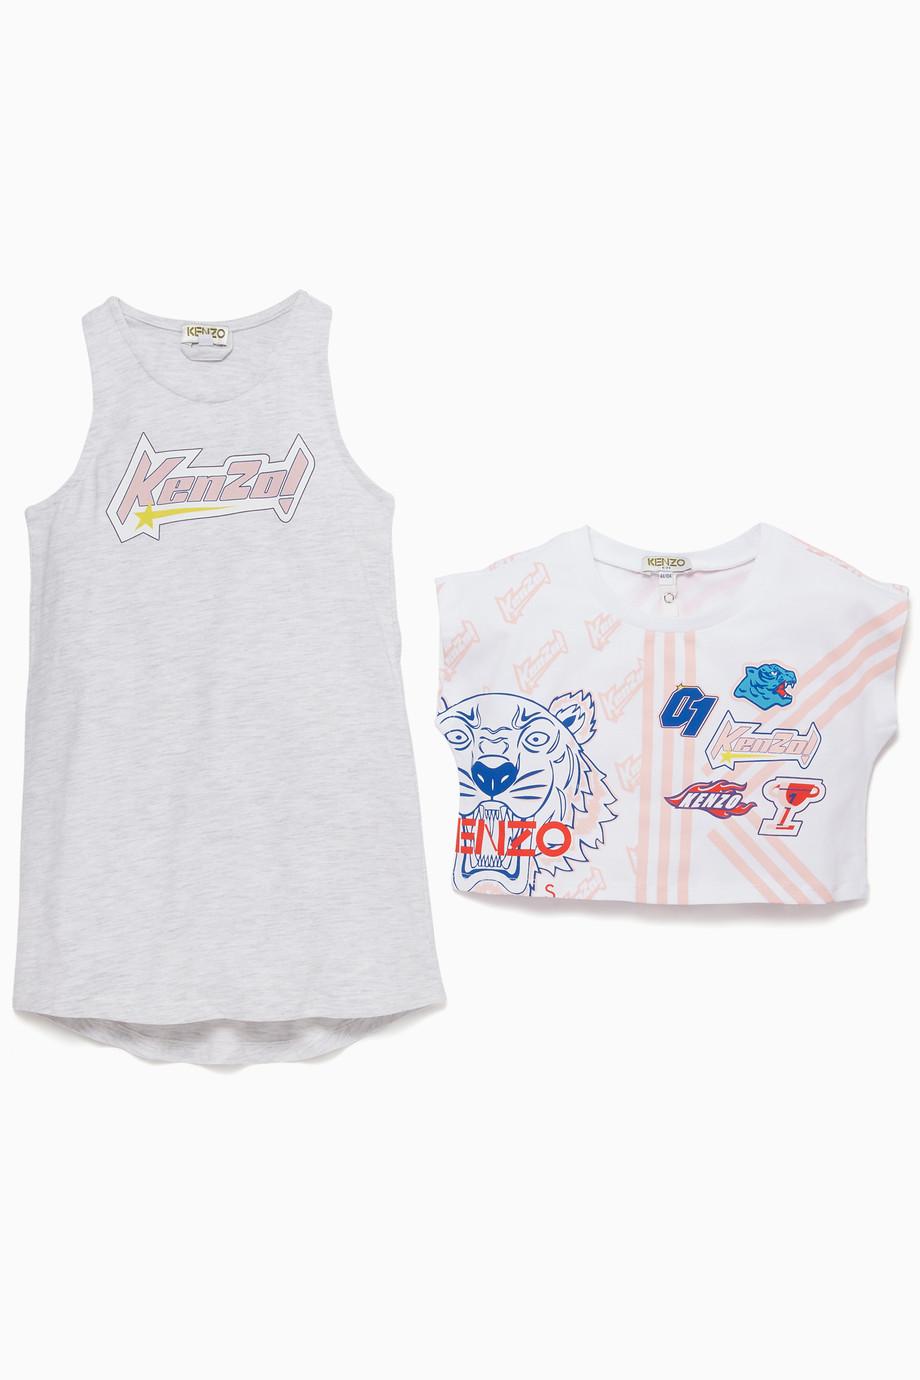 61b49be0 Shop Kenzo Grey Printed T-Shirt Dress Set for Kids | Ounass